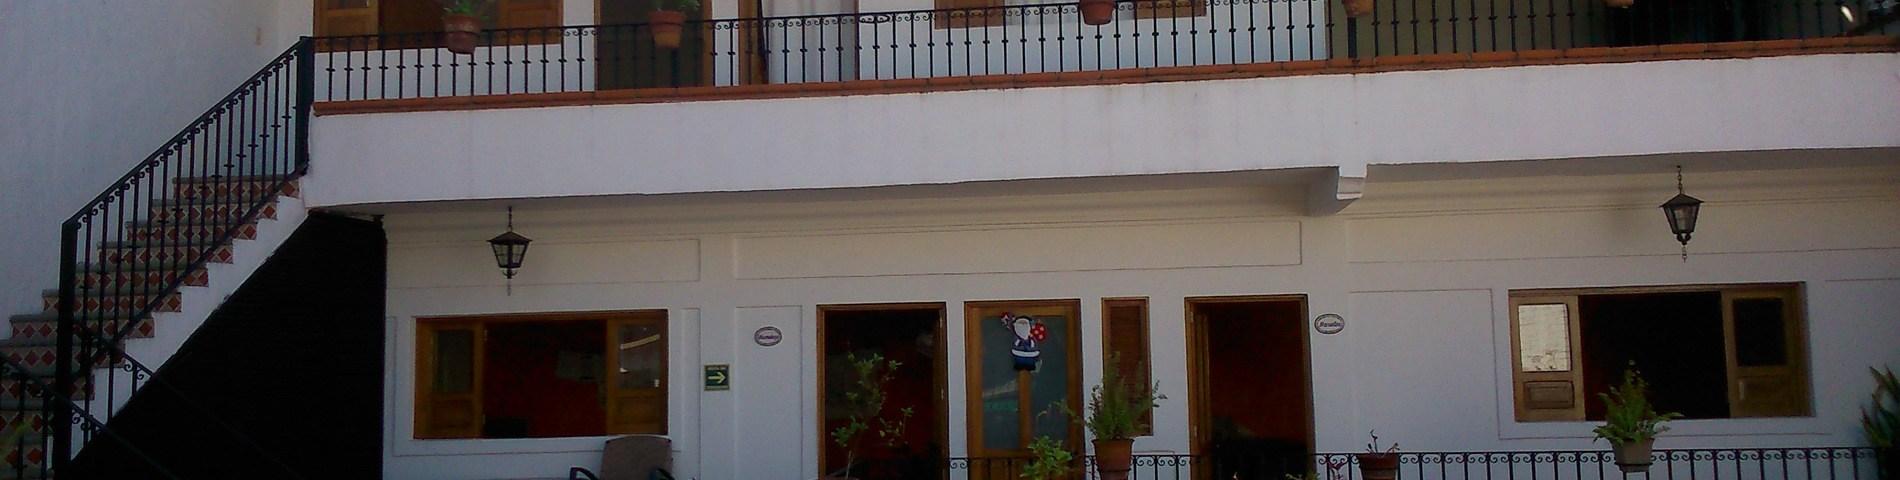 Spanish Experience Center billede 1